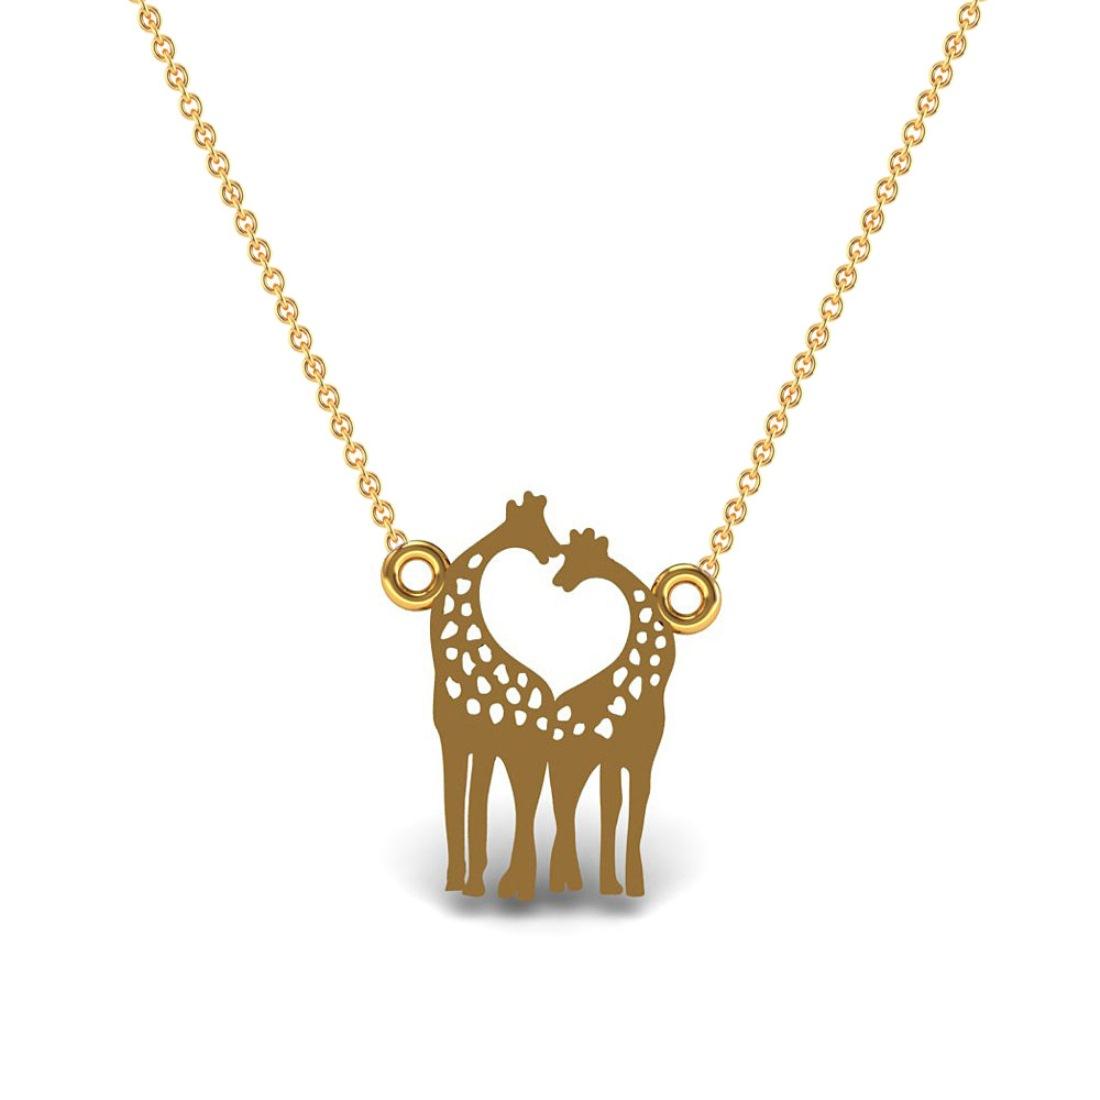 Giraffe shape kids pendant solid gold jewelry